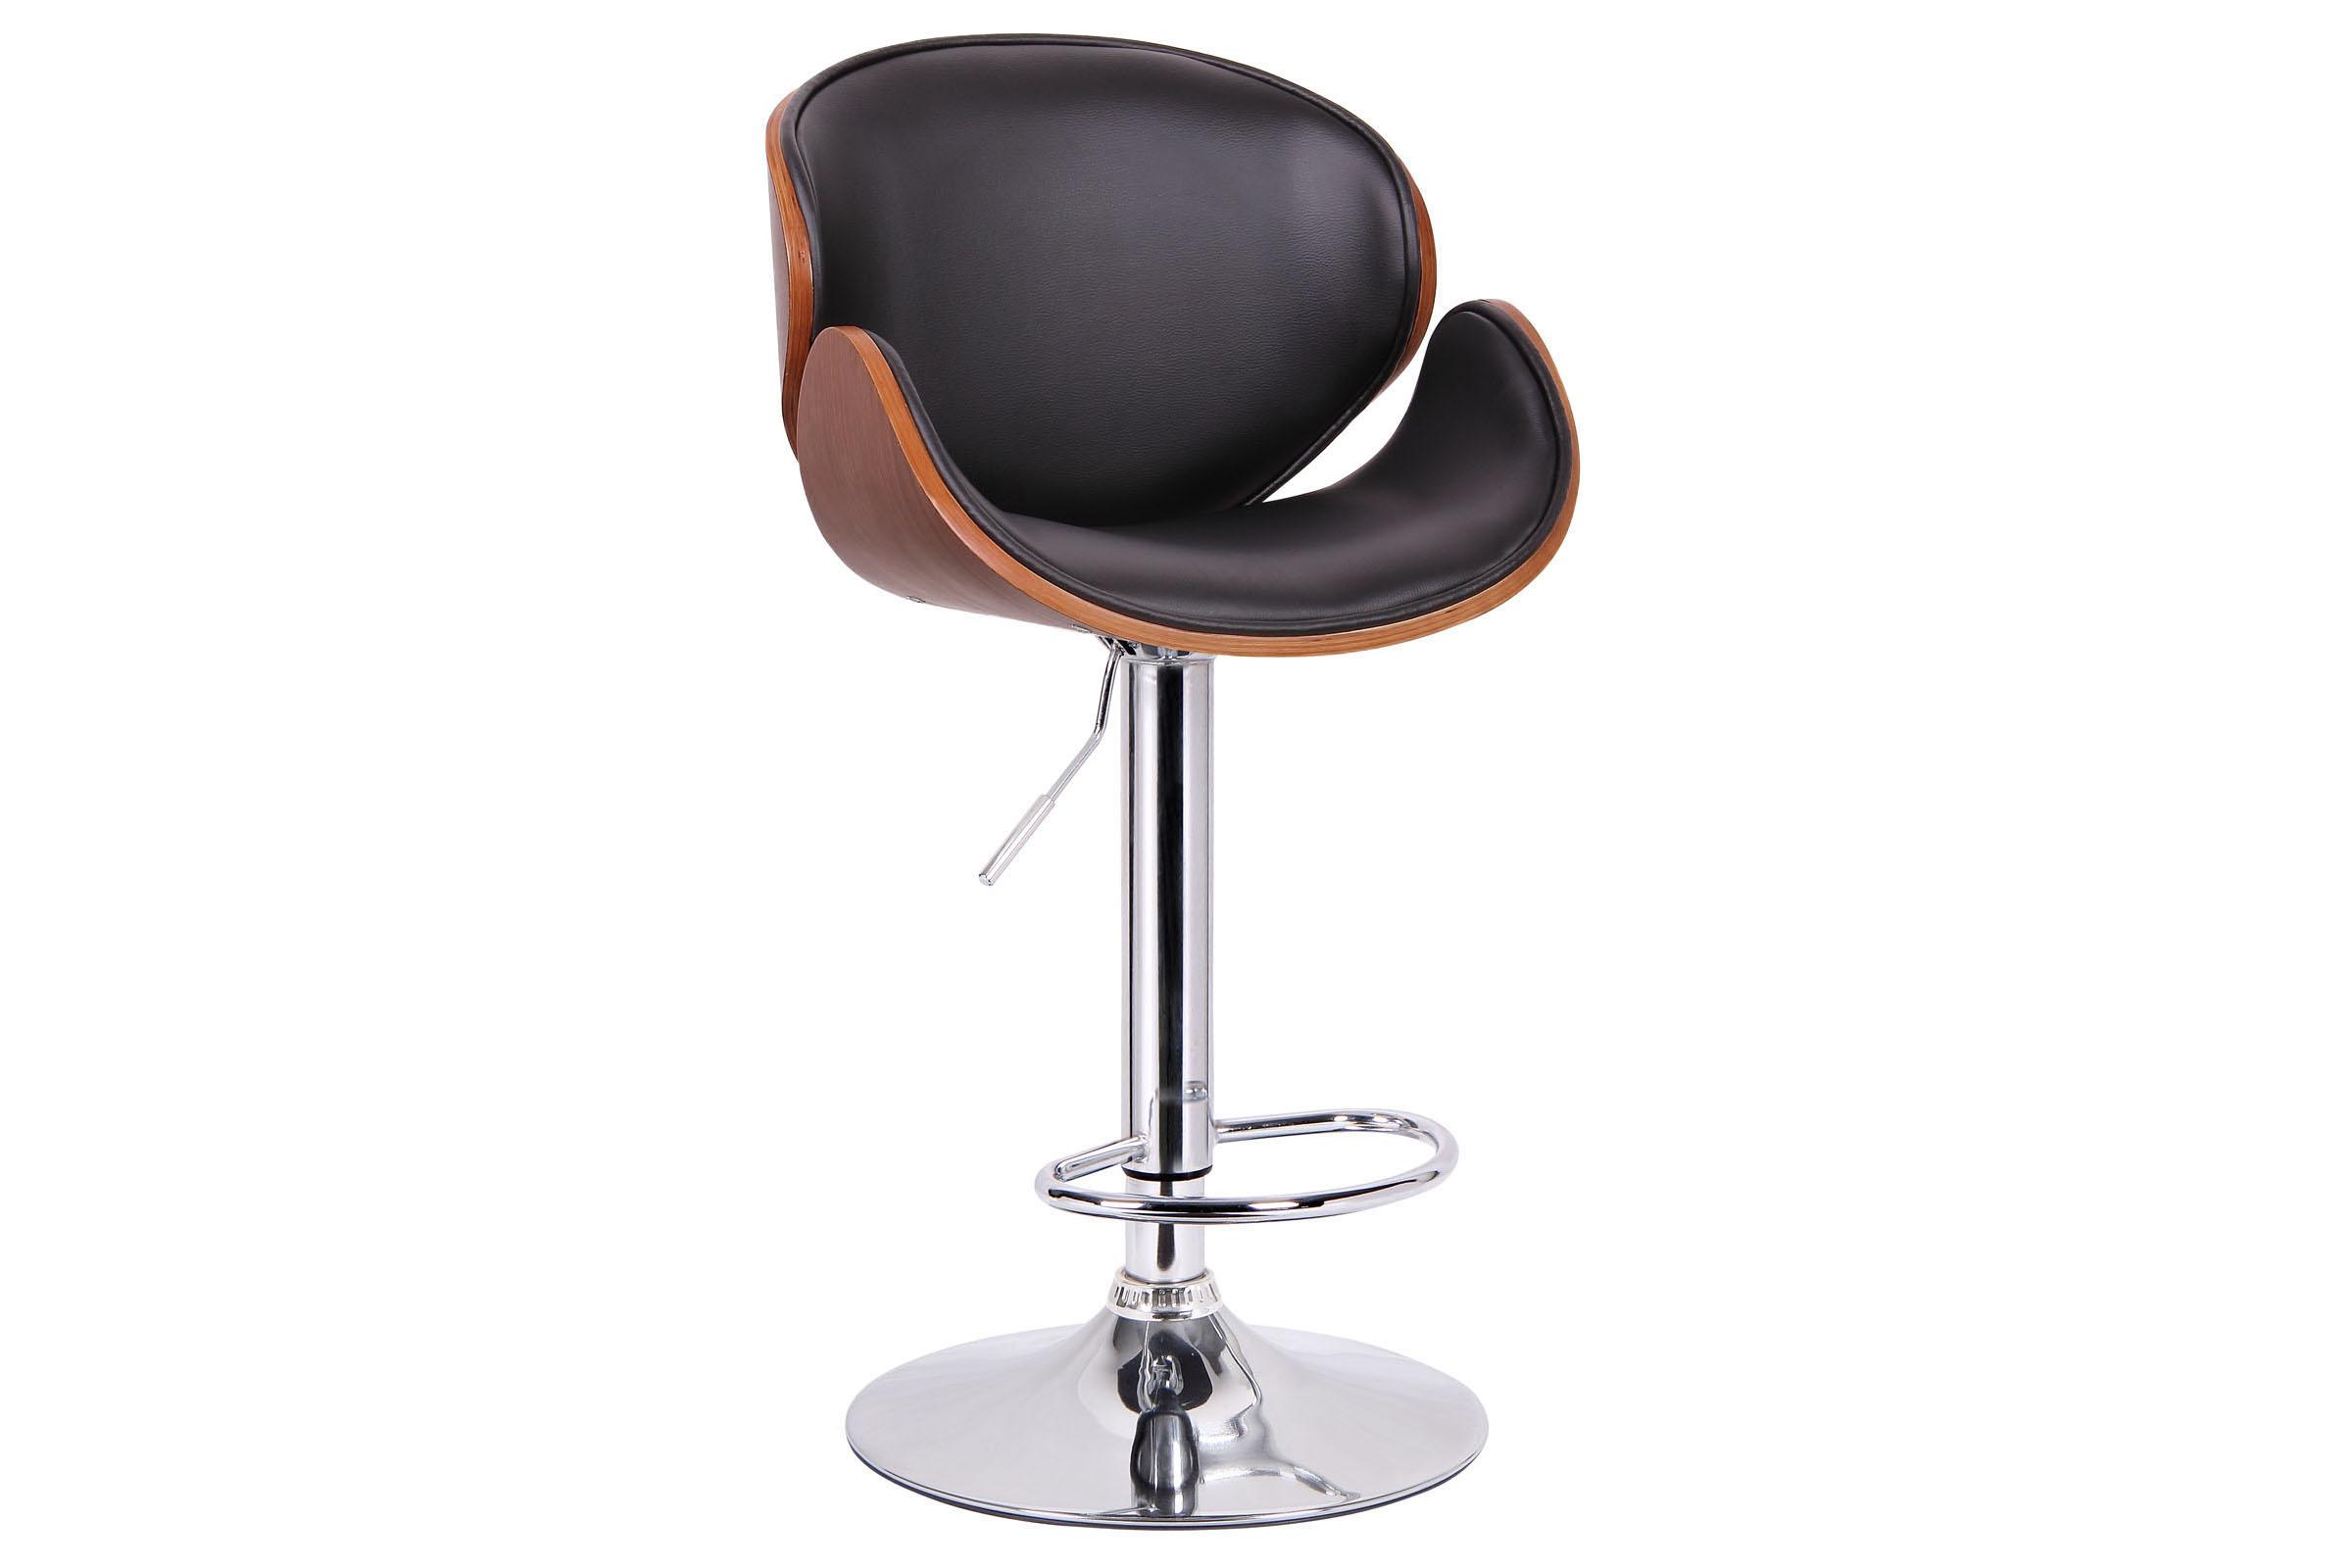 Crocus Walnut And Black Modern Bar Stool Affordable